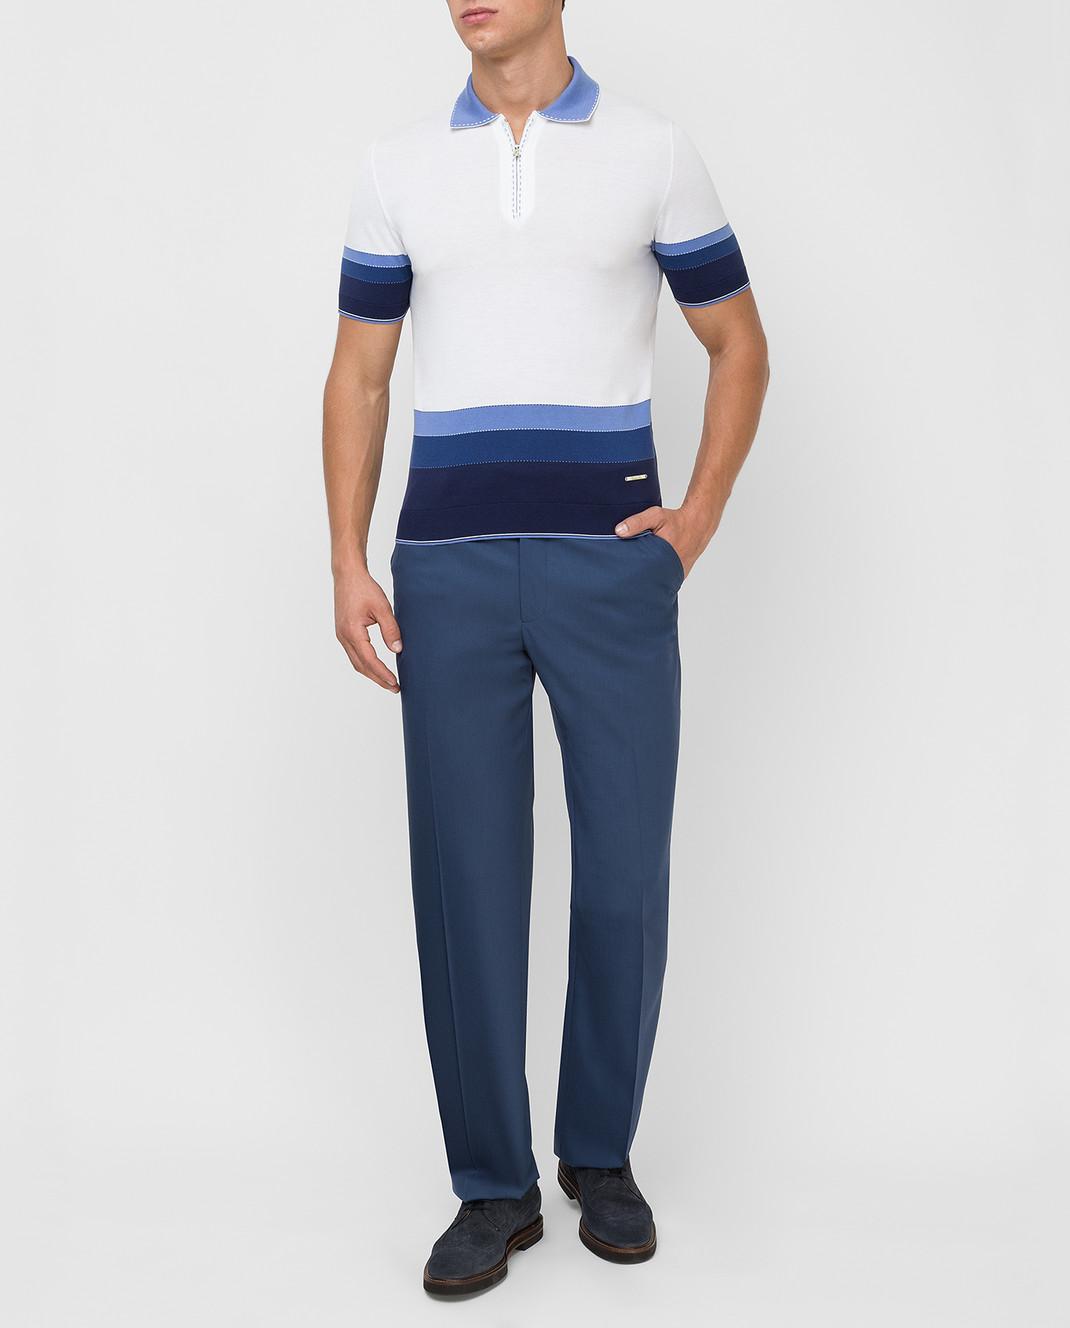 Castello d'Oro Синие брюки изображение 2